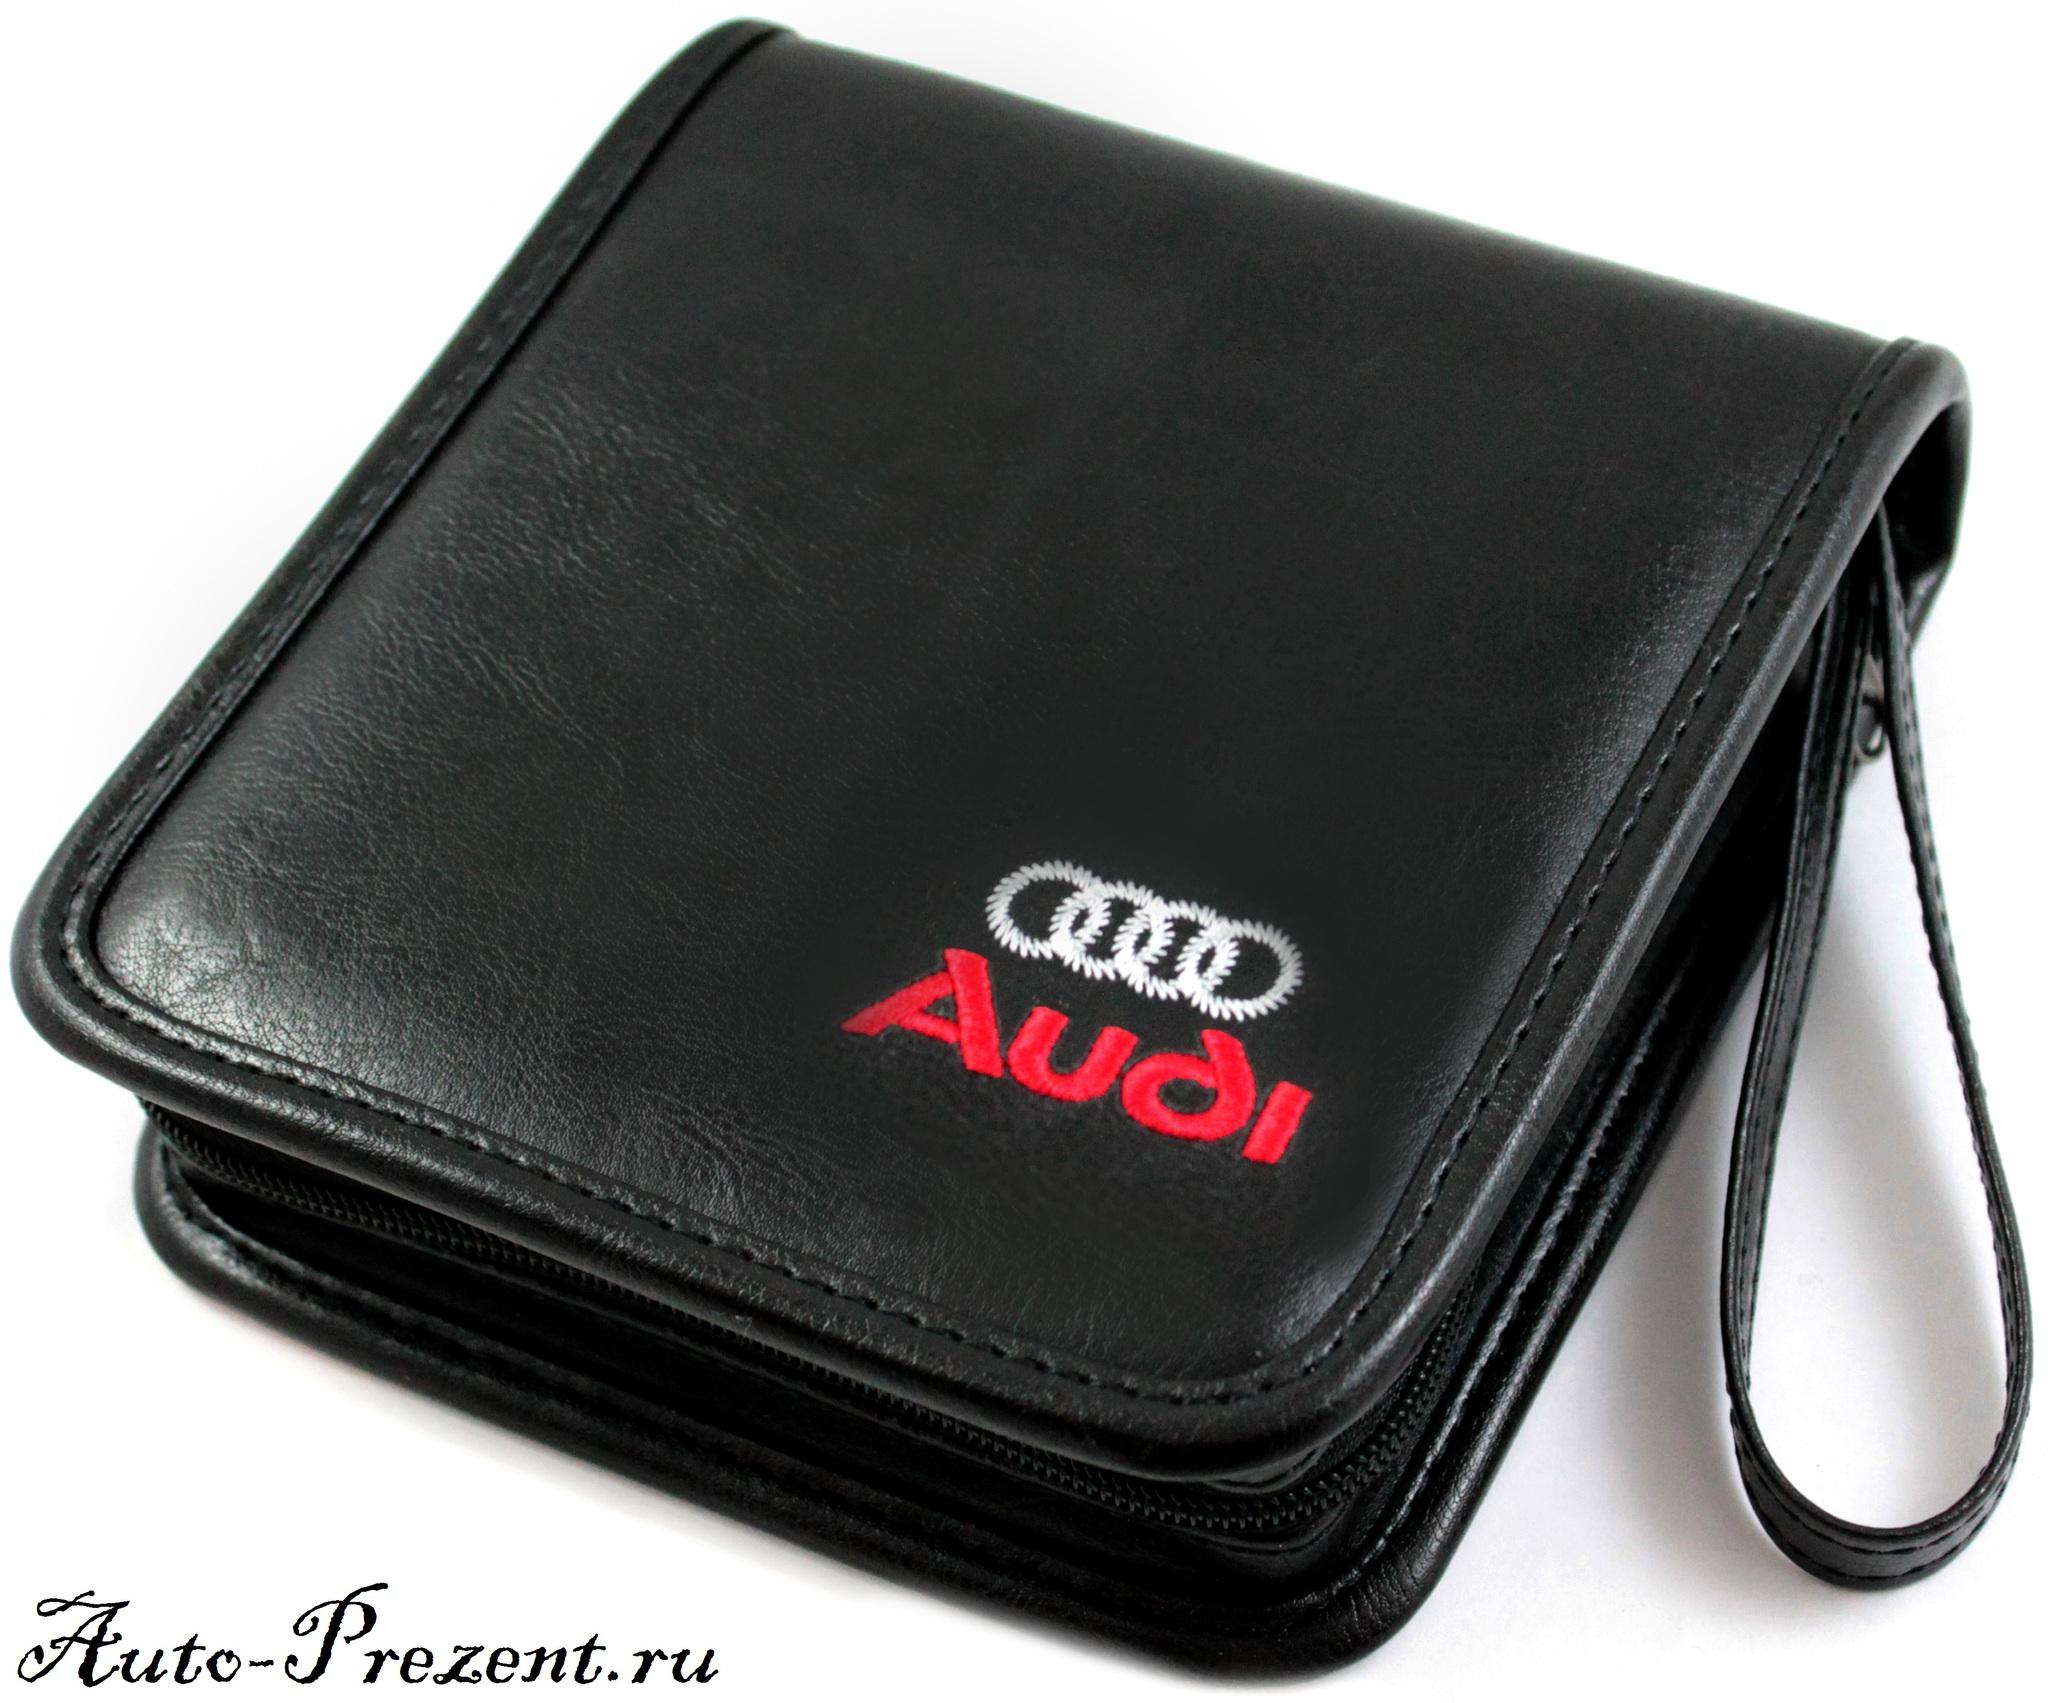 Портмоне для cd, dvd дисков с логотипом AUDI